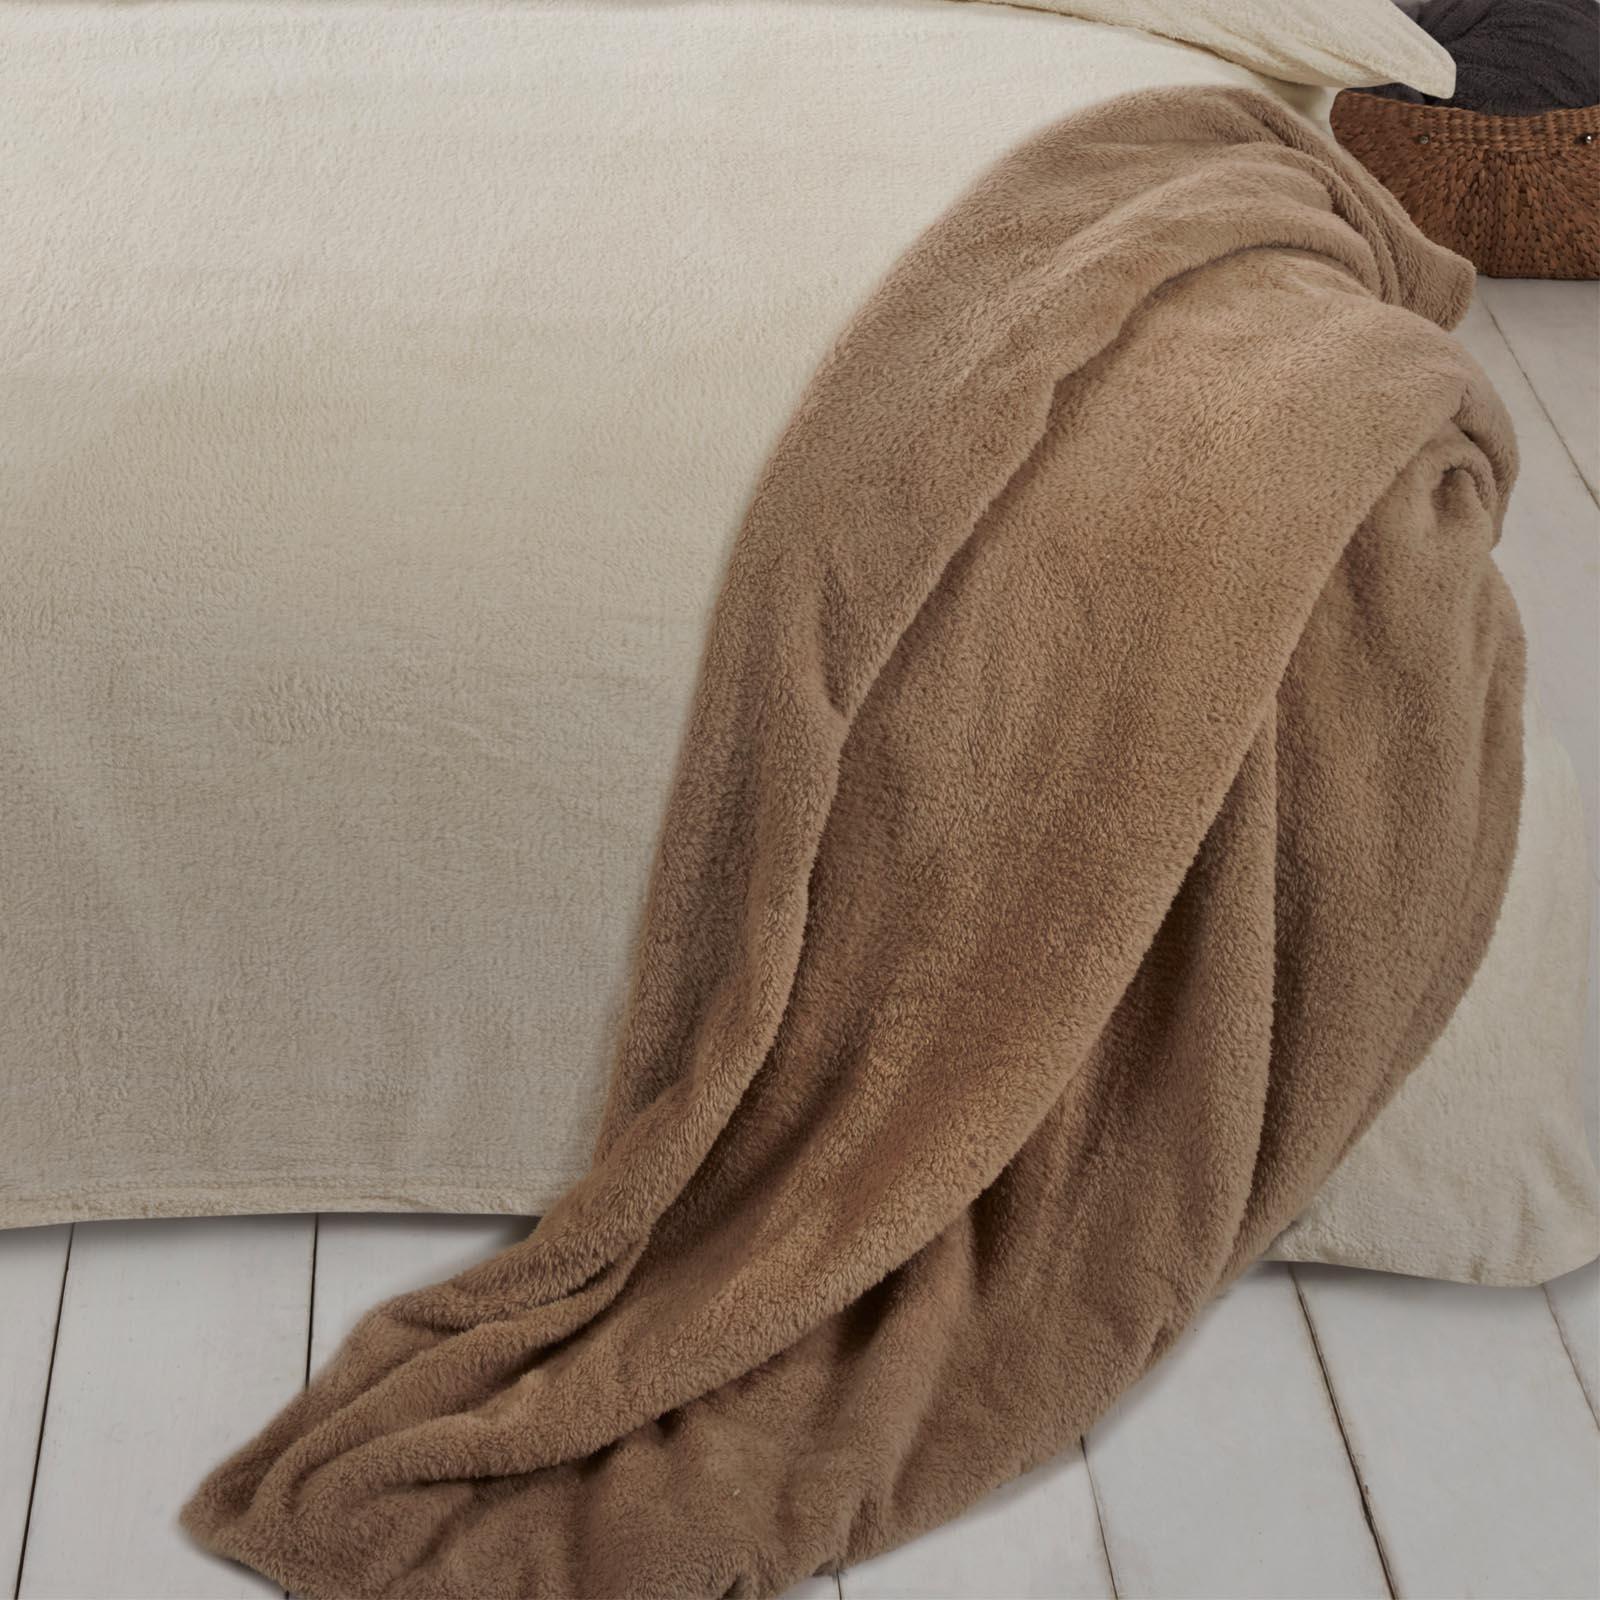 Brentfords-Teddy-Fleece-Bear-Blanket-Large-Throw-Over-Bed-Plush-Soft-Bedspread thumbnail 18